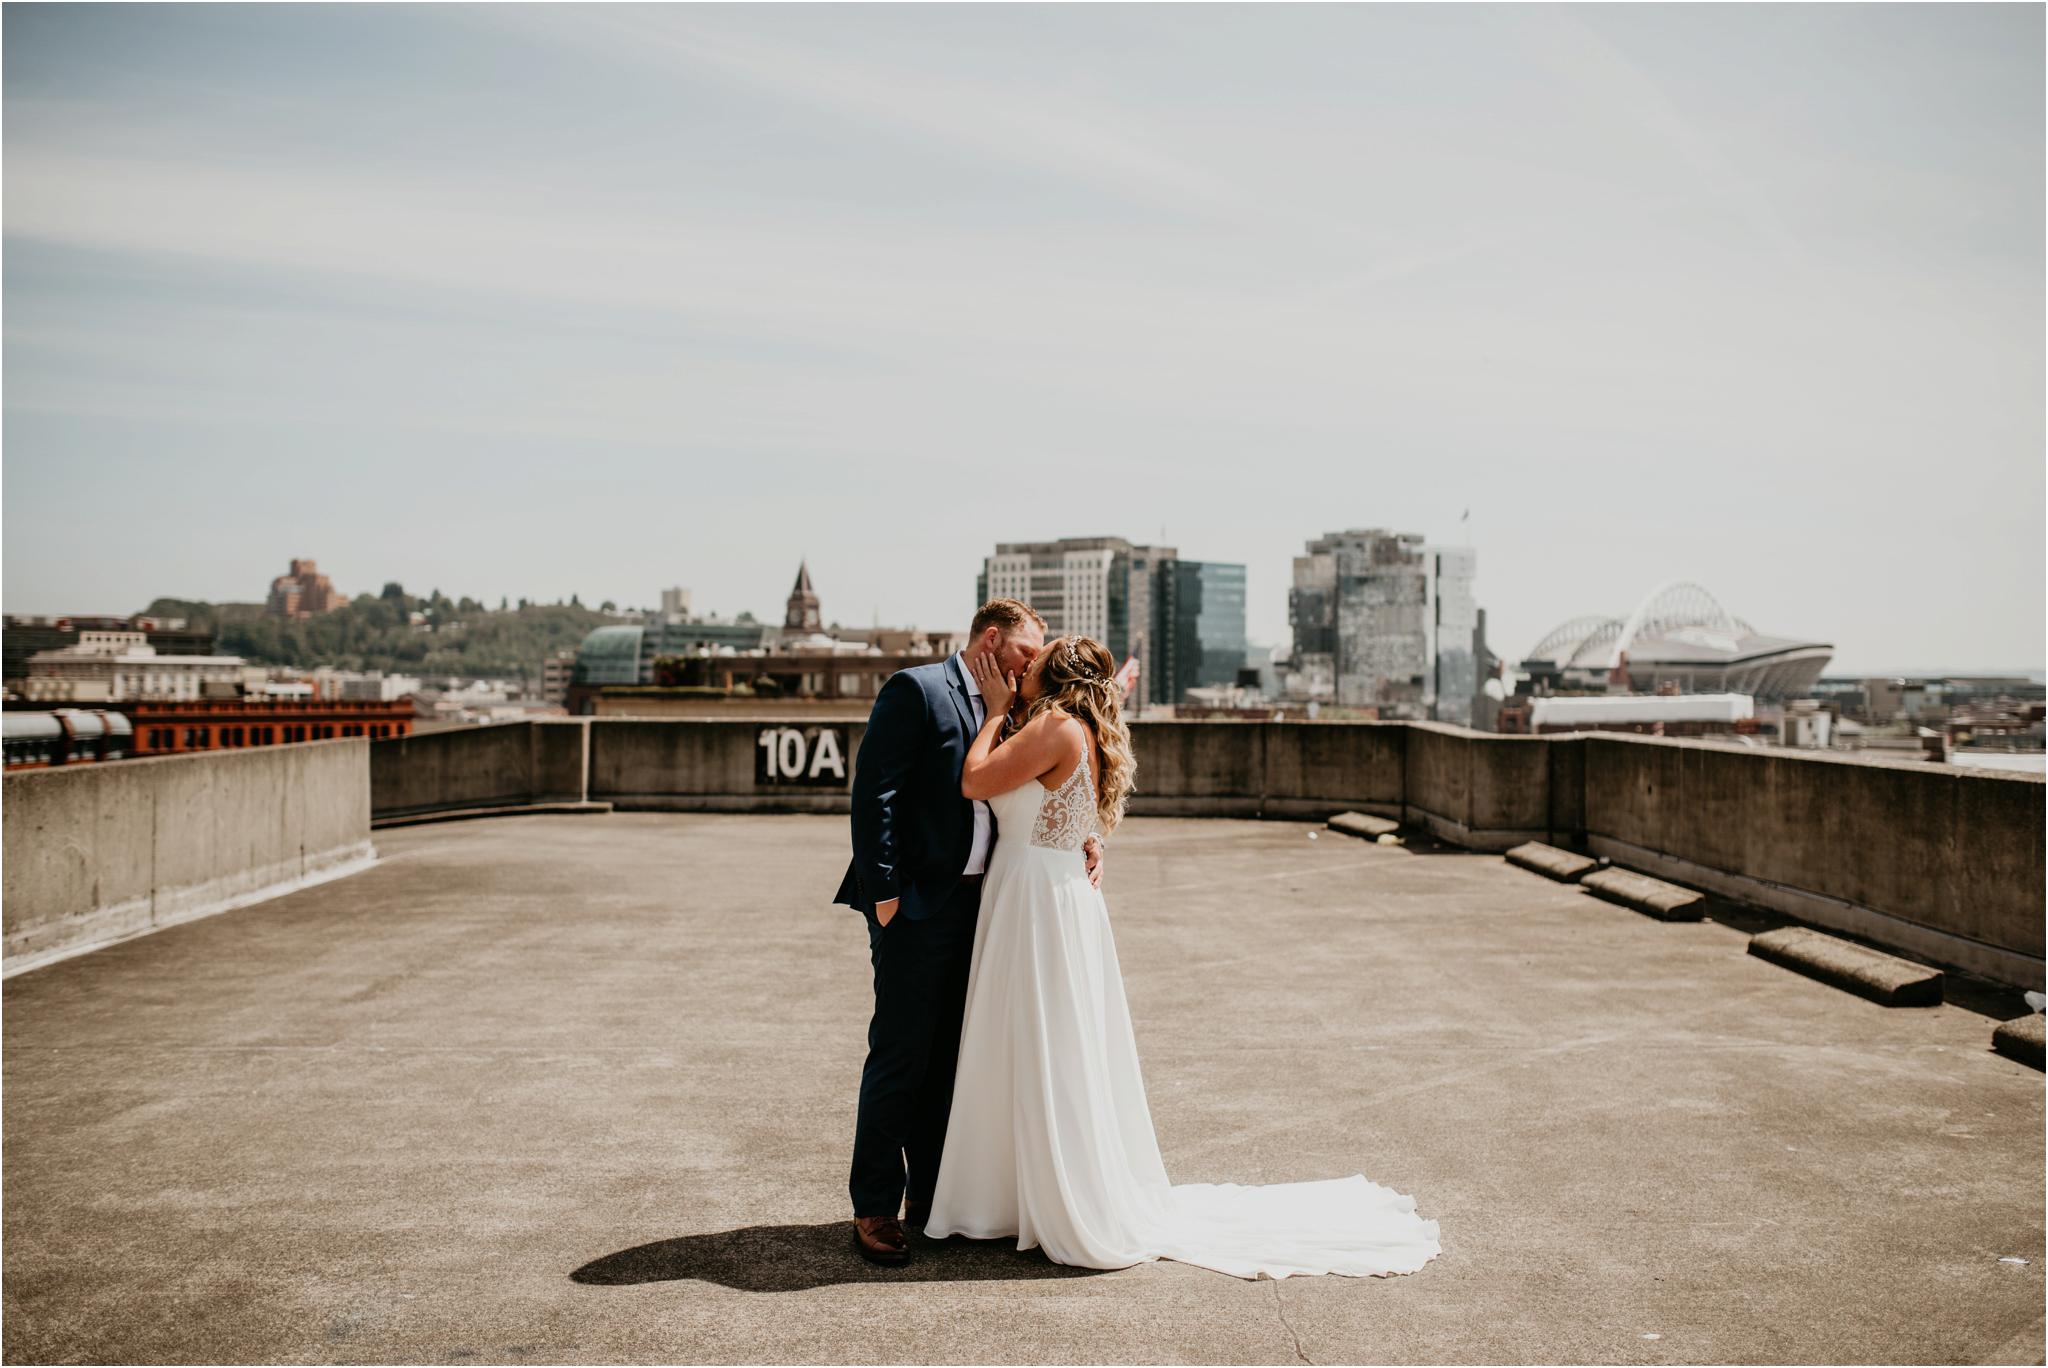 laura-and-matt-metropolist-urban-seattle-wedding-photographer-041.jpg